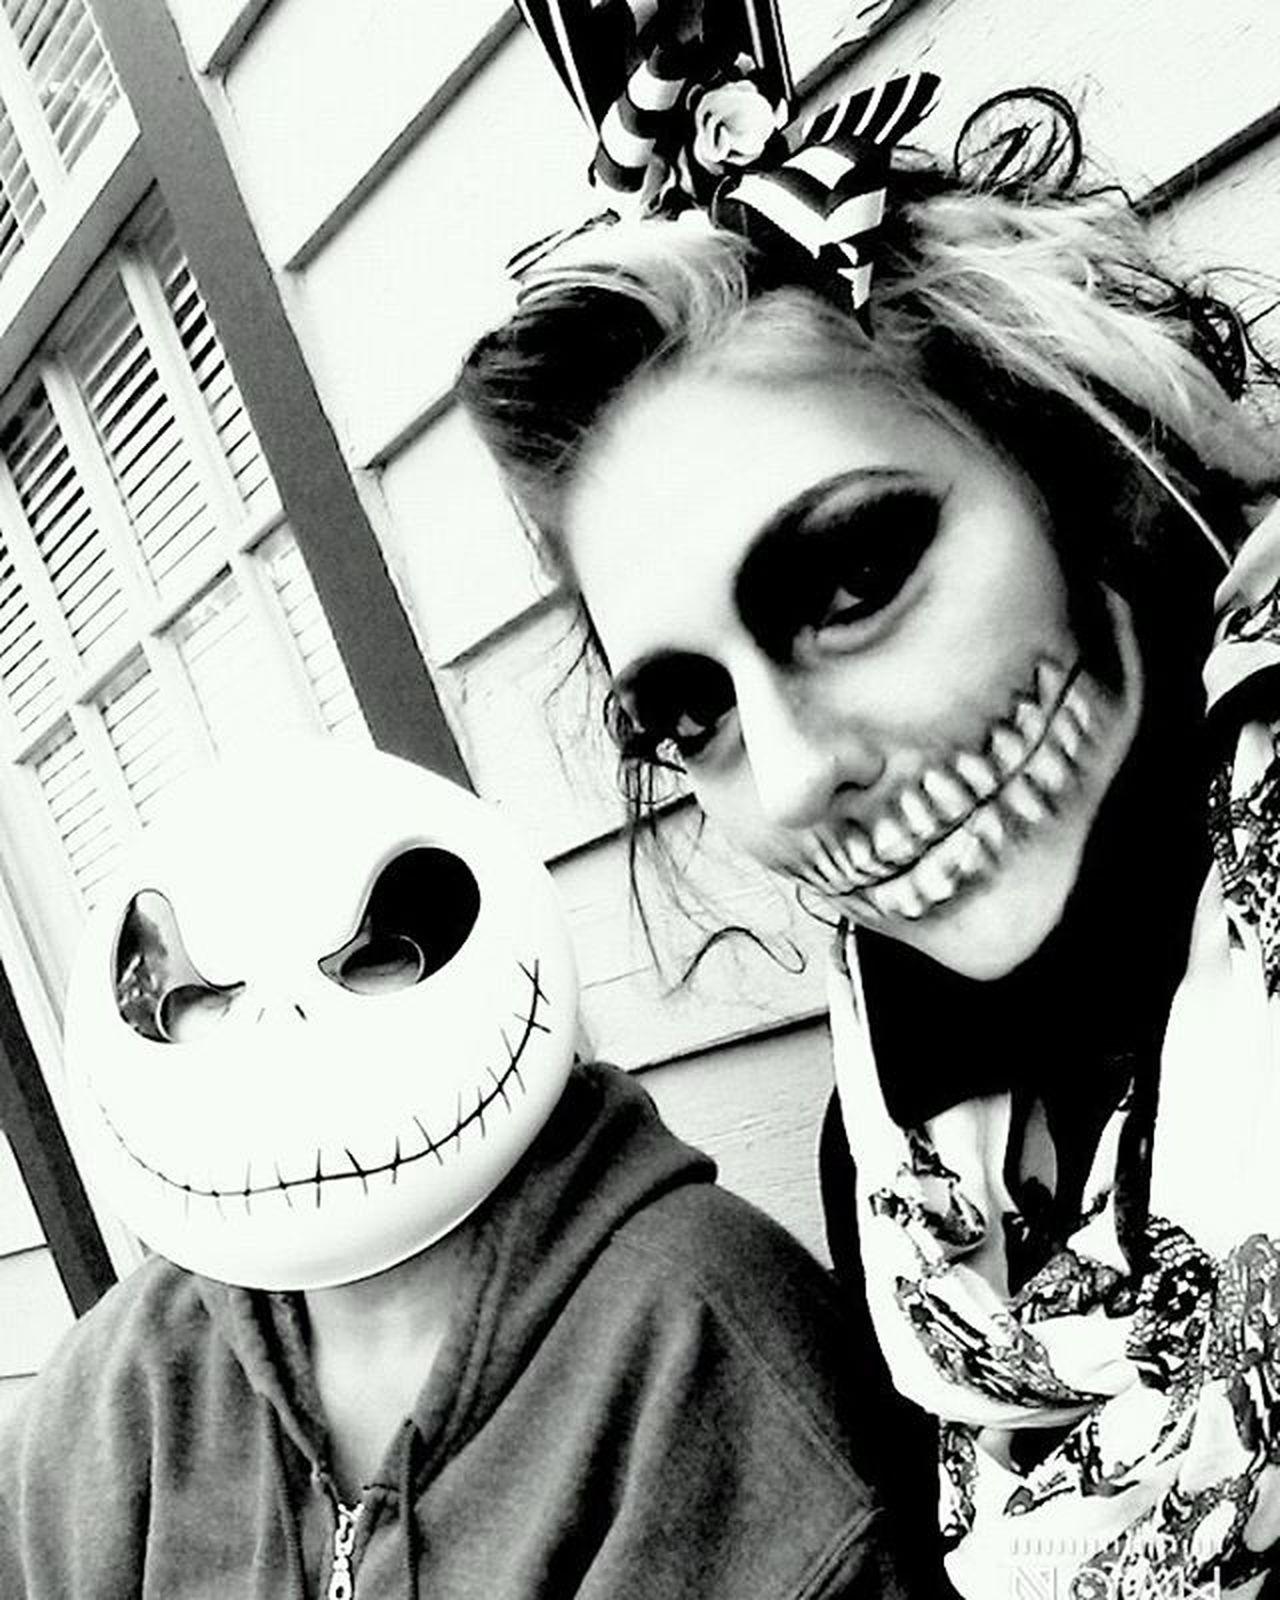 Smithvillezombiewalk Ghouls Skulls Jack Bw Blackandwhite Zombiewalk